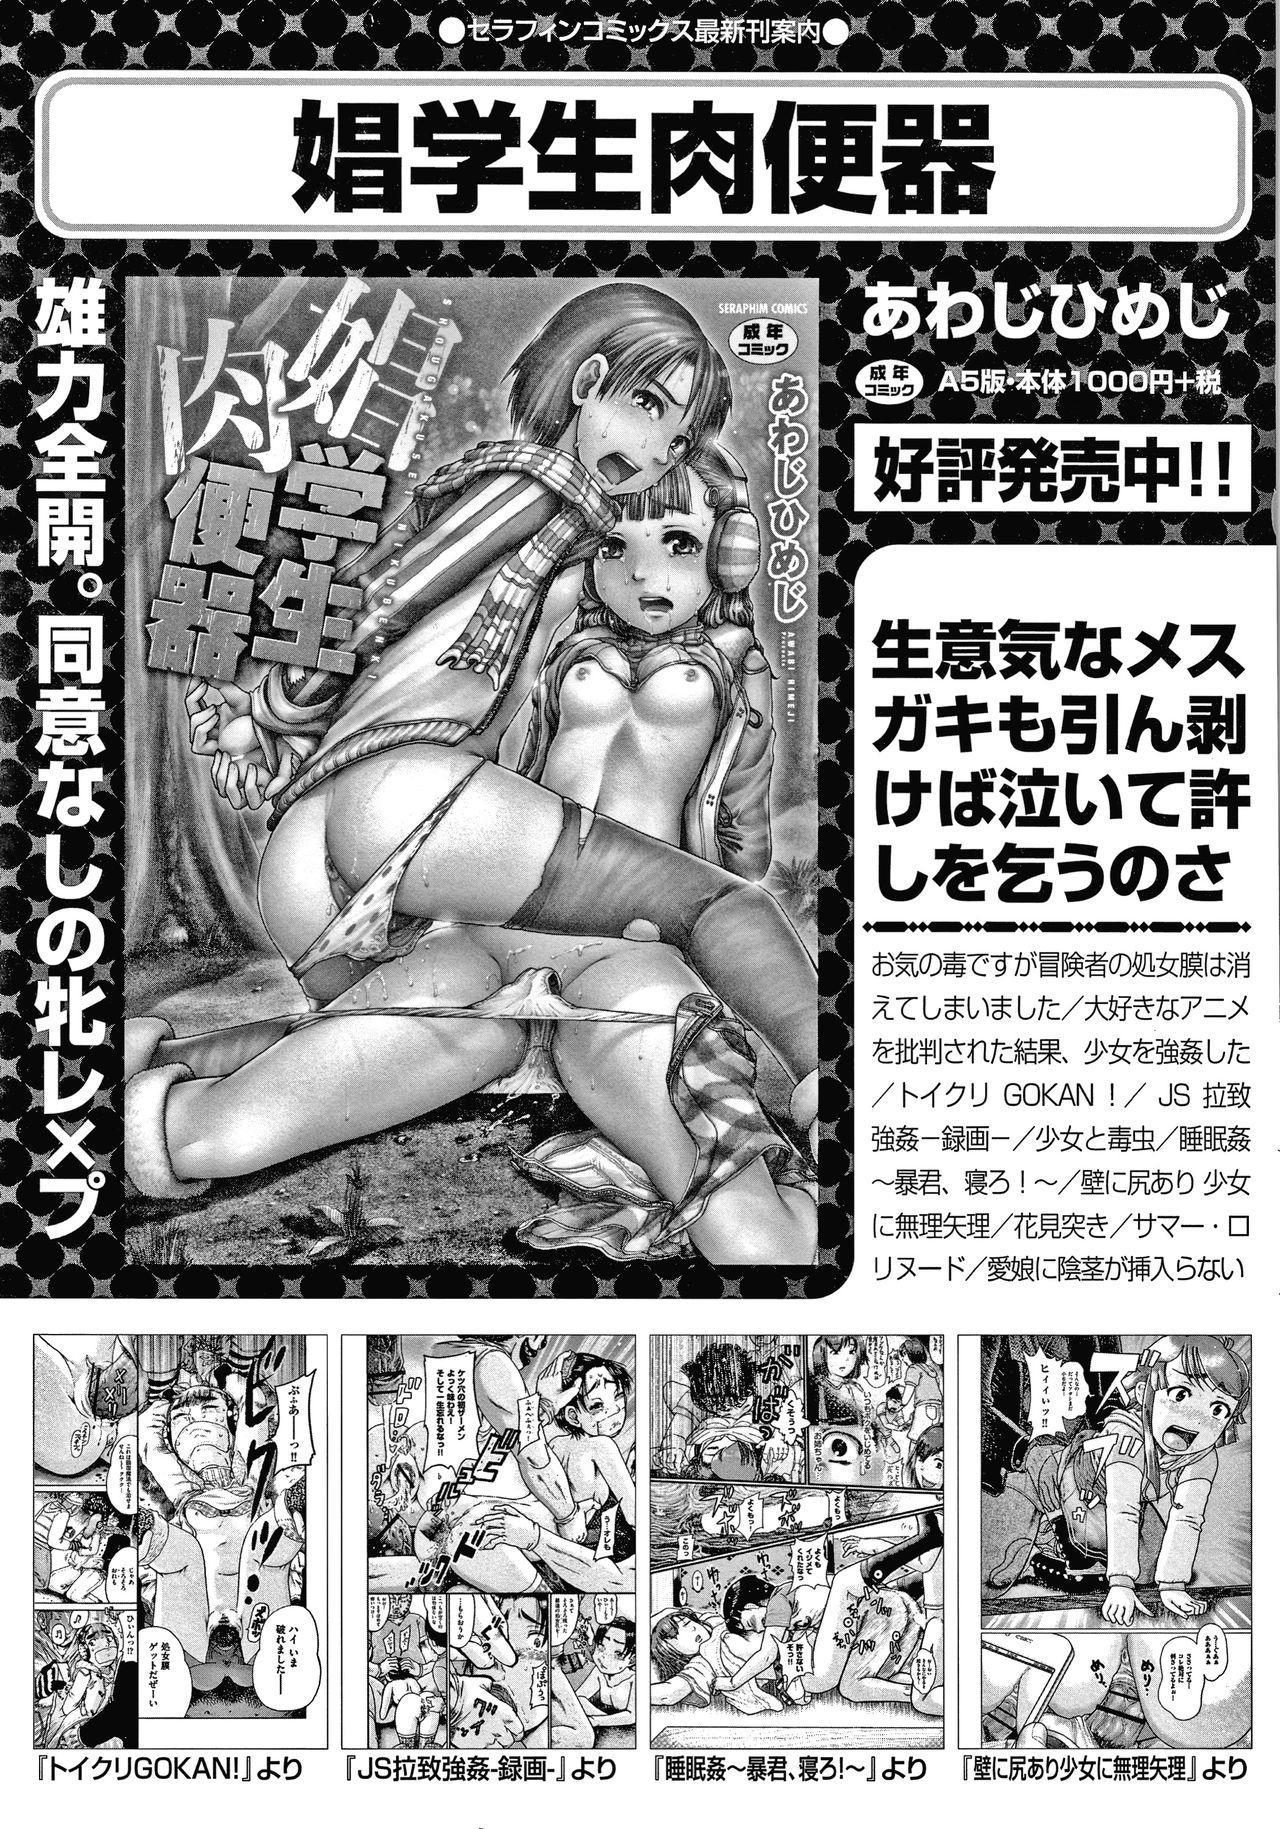 Shoujo Kumikyoku 15 163